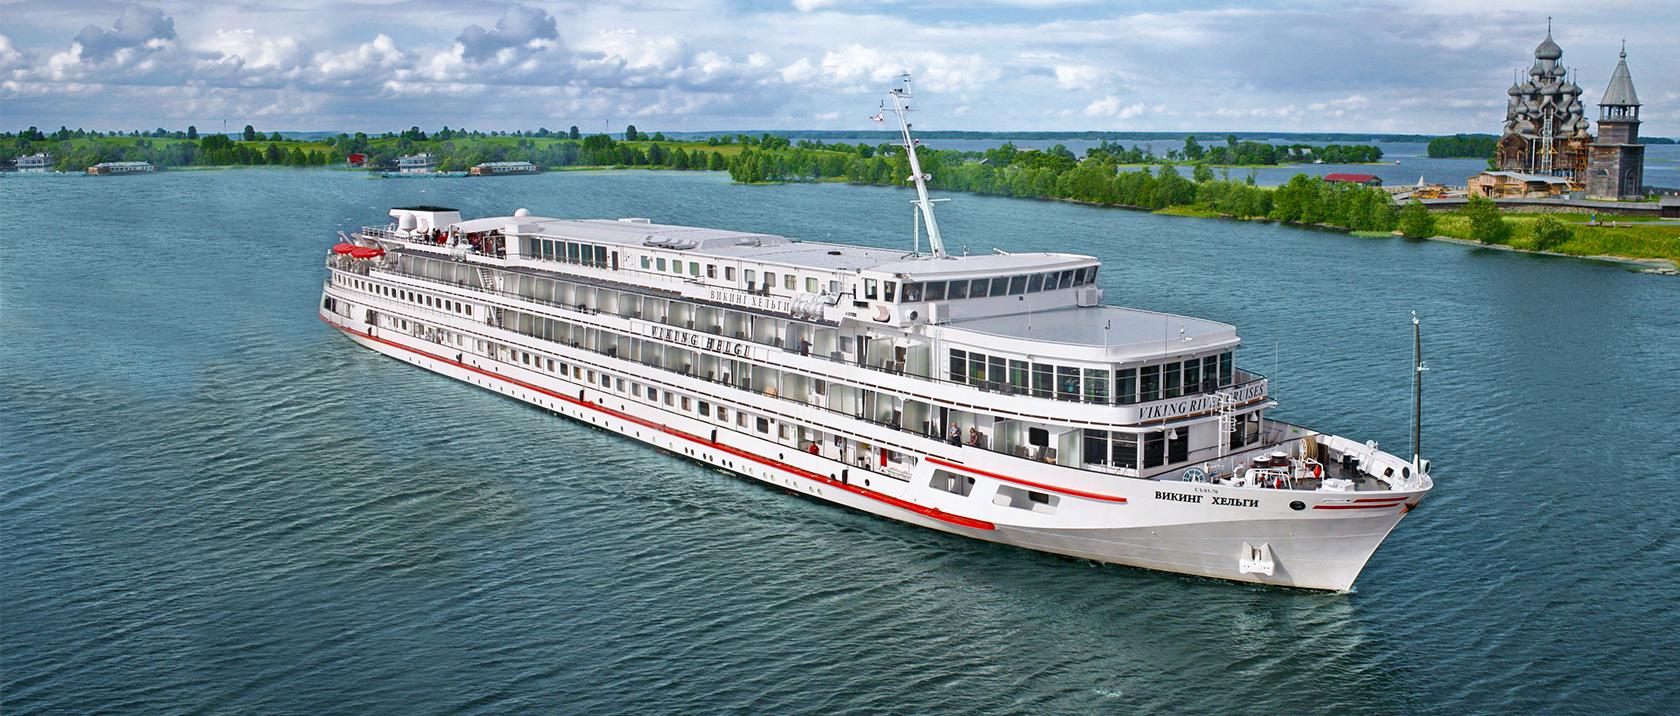 About The Viking Helgi Viking River Cruises